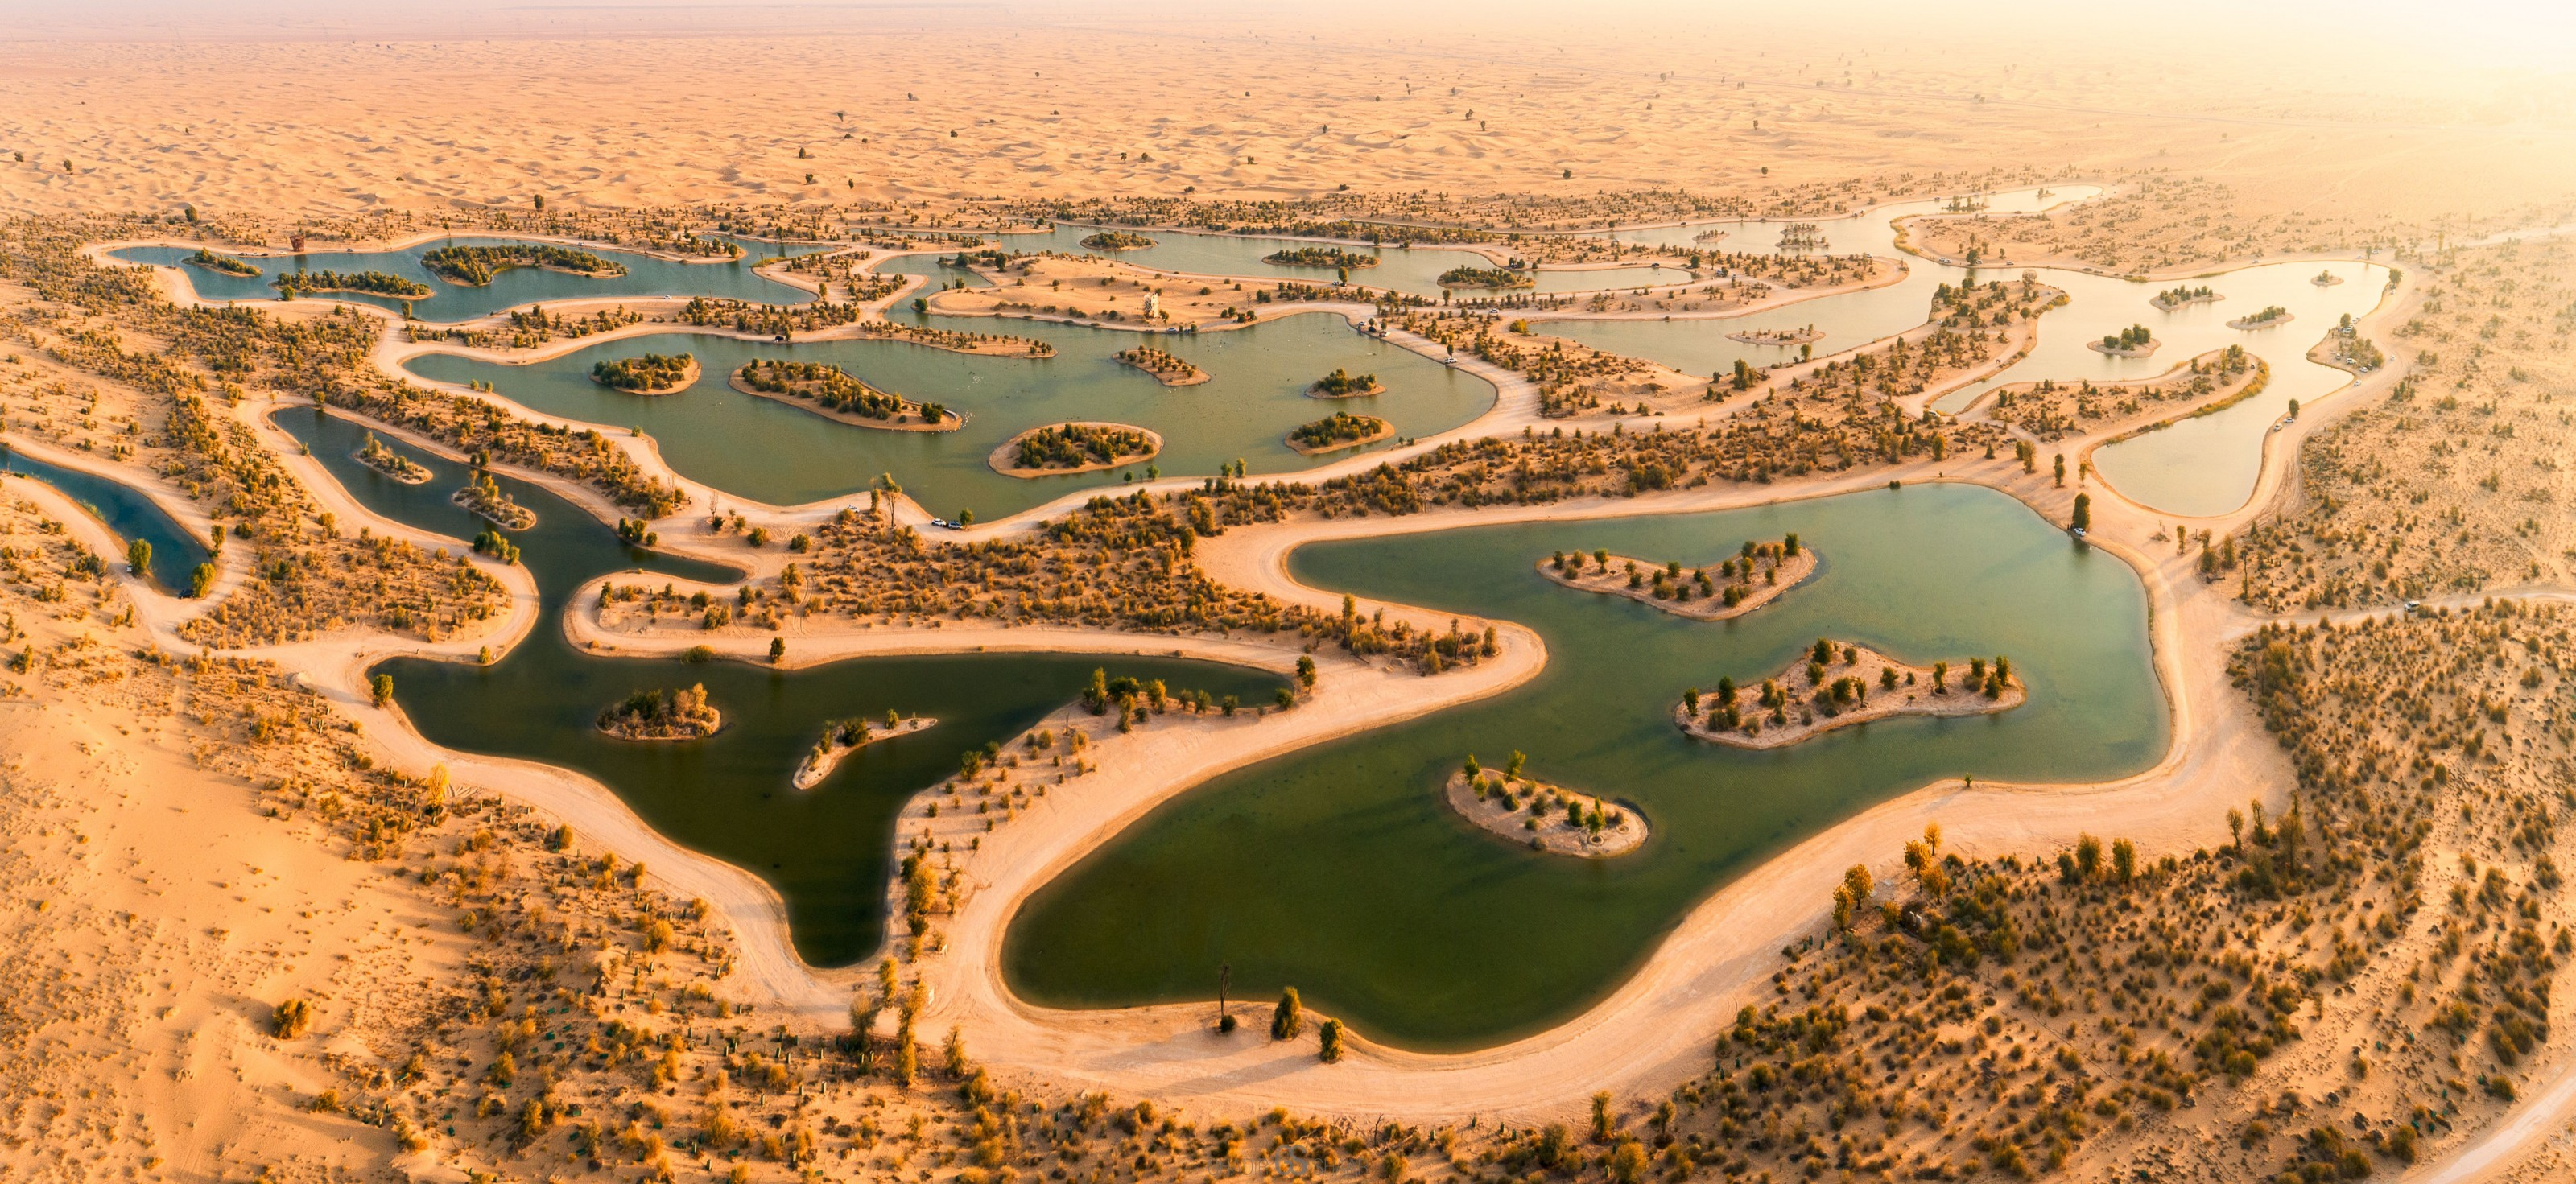 Oásis do deserto